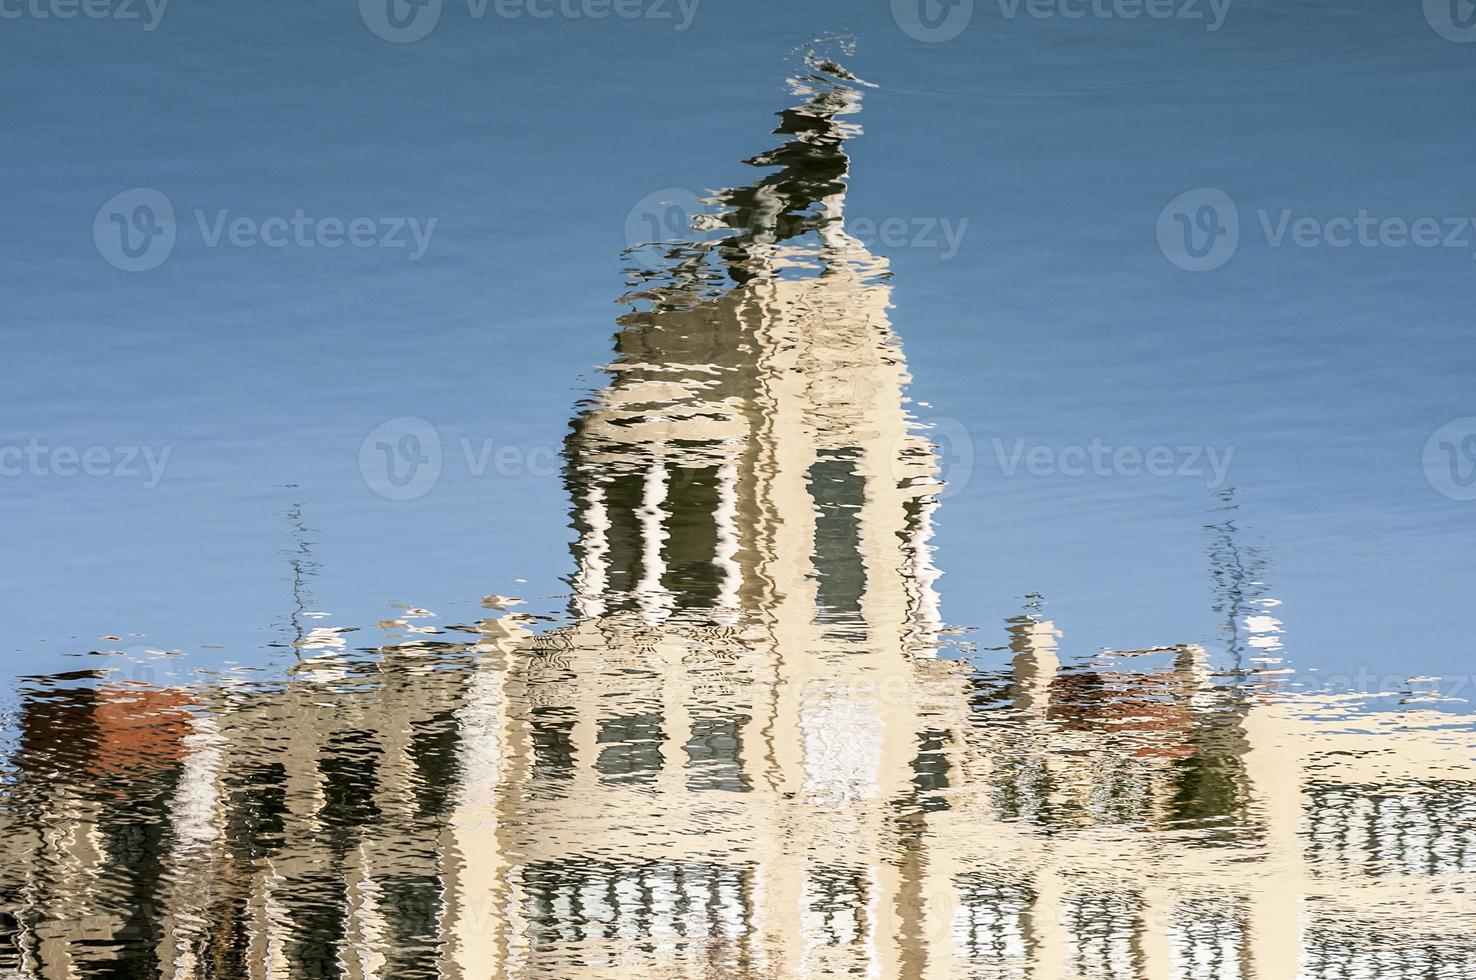 edificios de bilbao foto